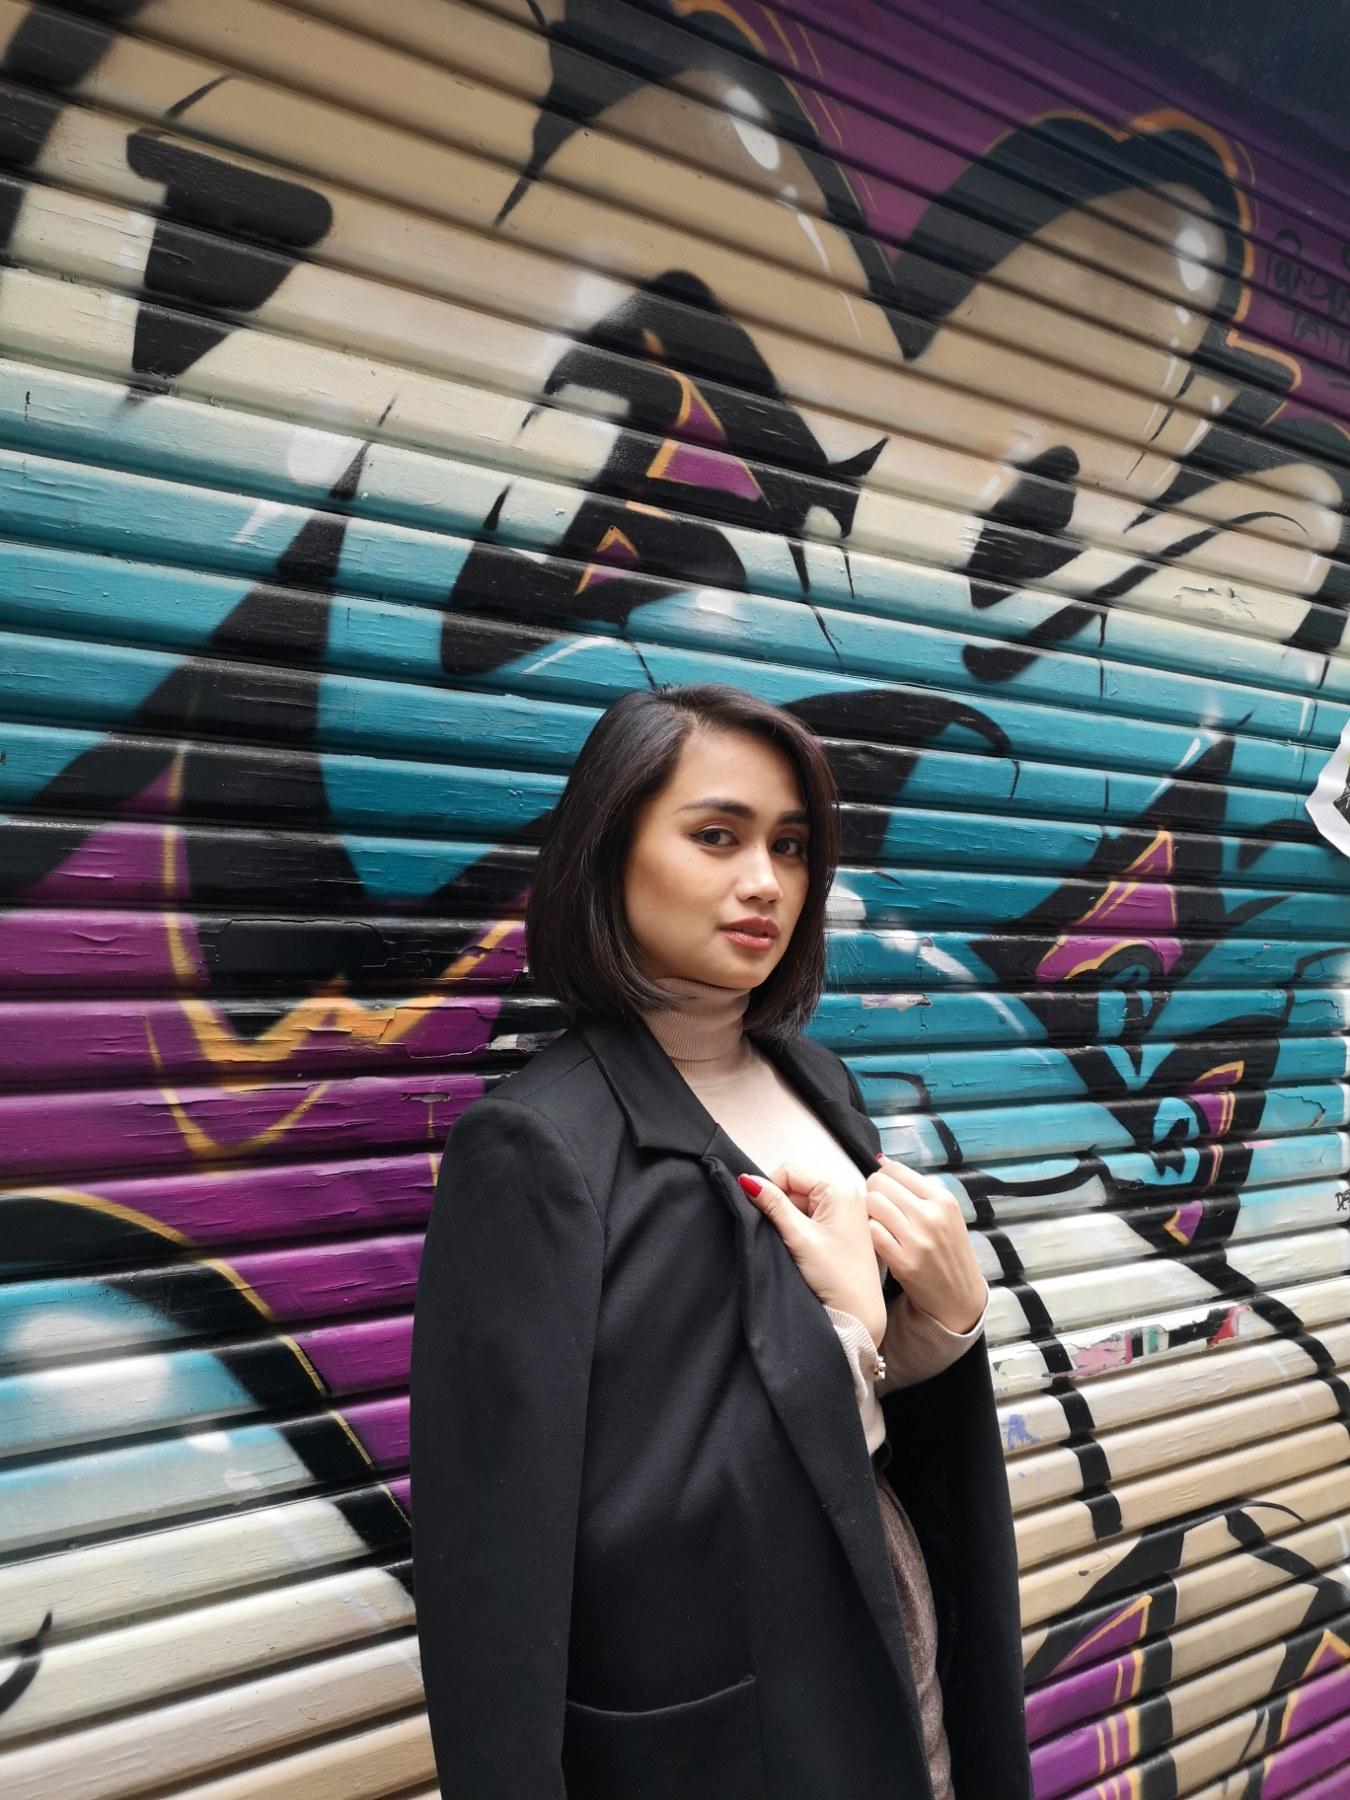 Leigh Nazaredo wearing a blazer and posing against a graffiti wall.